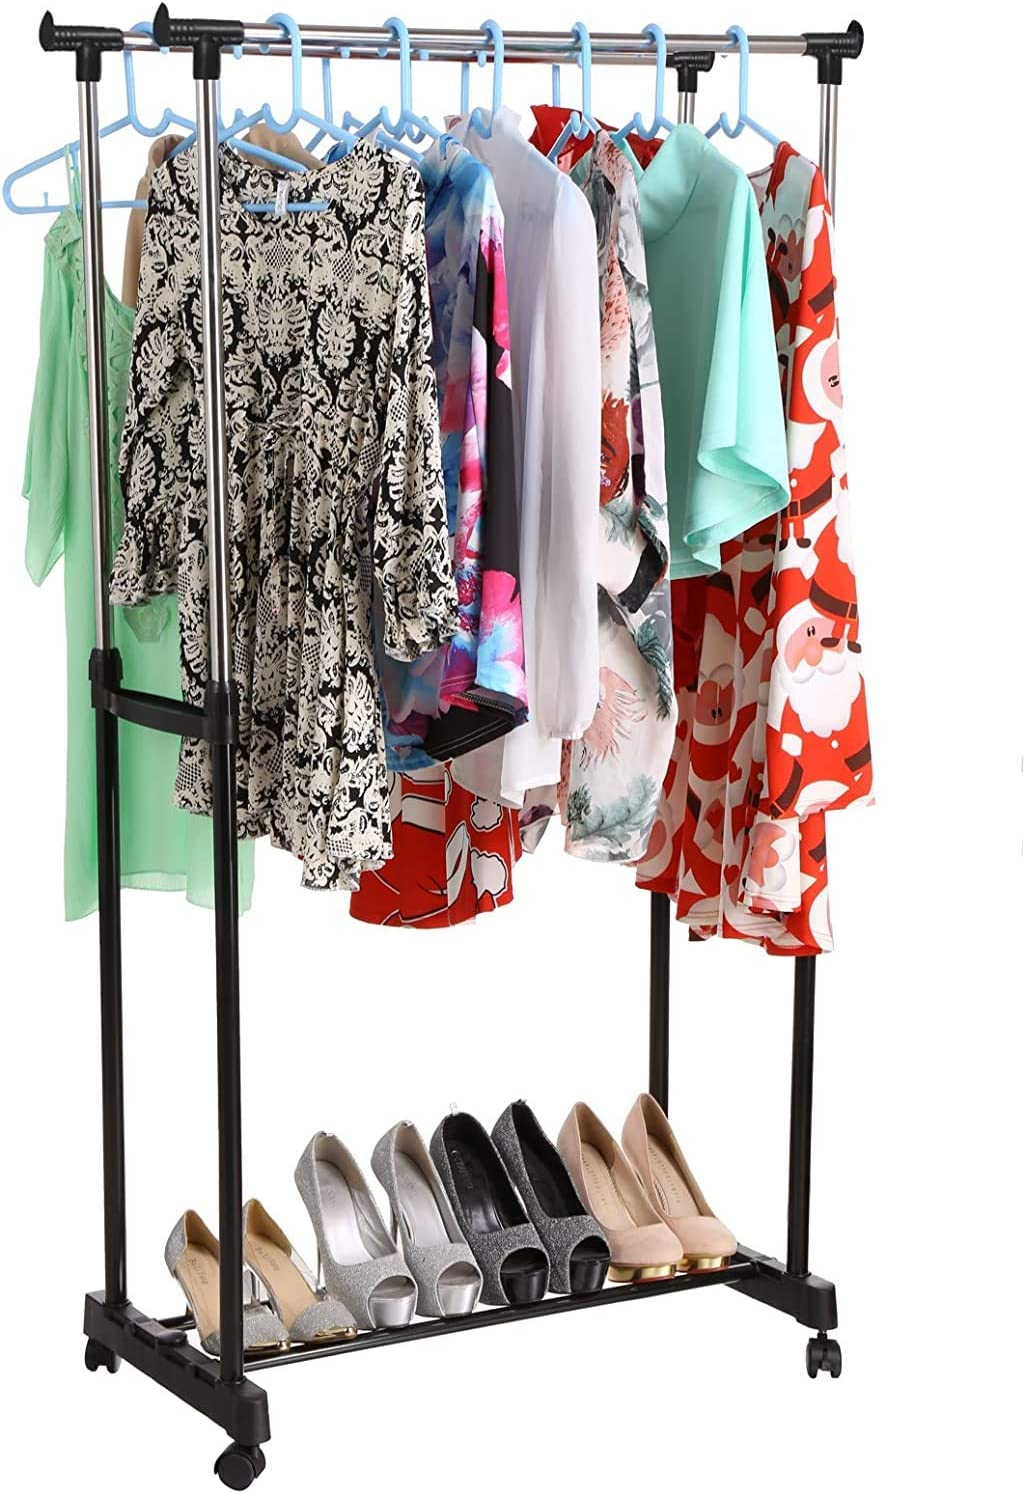 Homdox Double Rod Garment Rack Portable Adjustable Bedroom Clothing Hanging Rack with Castors